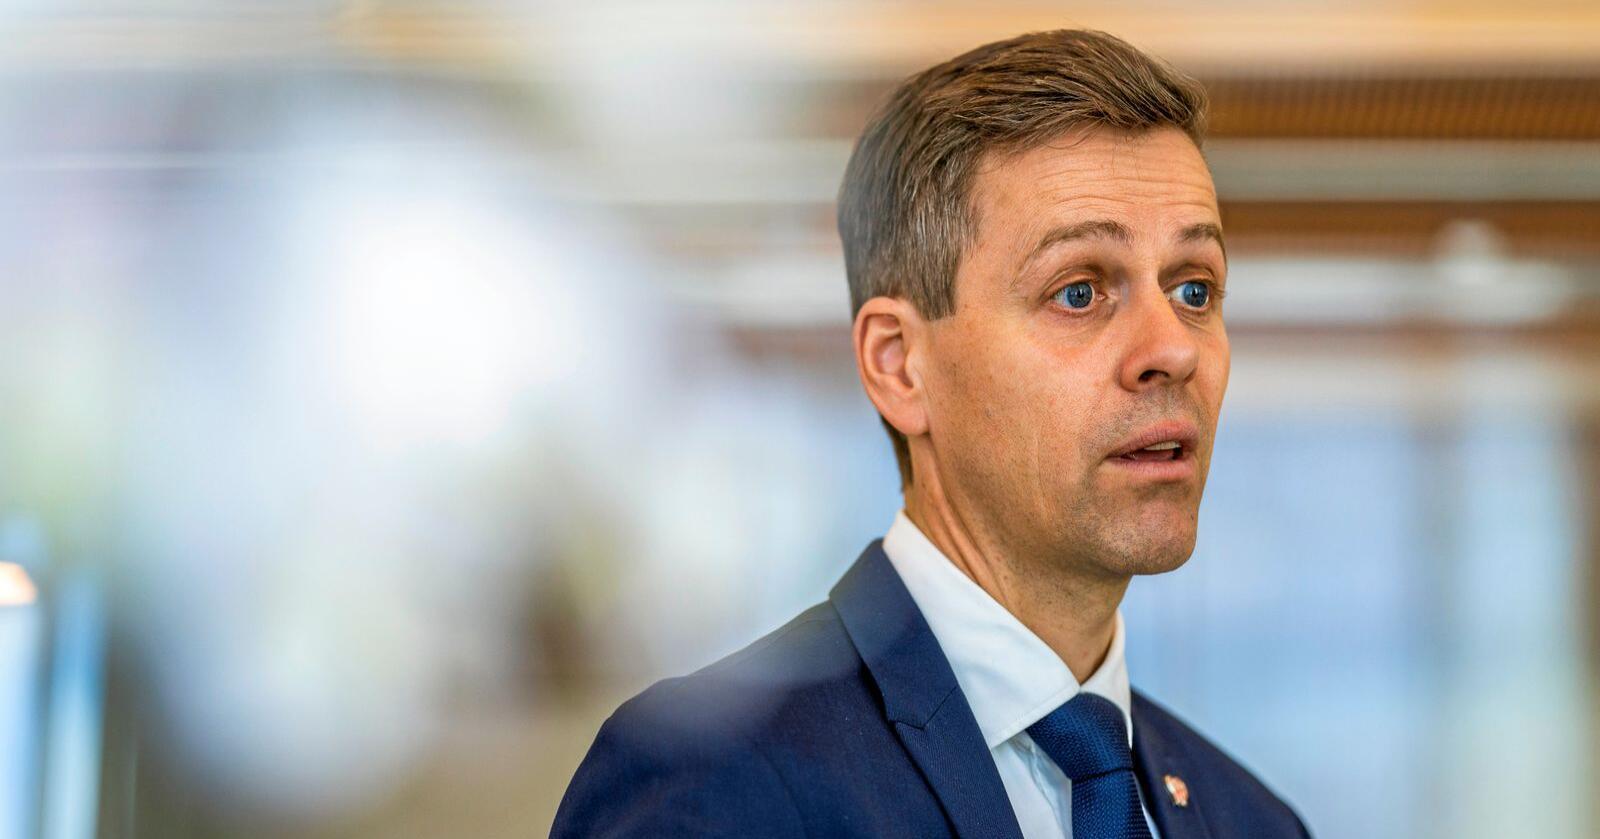 Samferdsleminister Knut Arild Hareide (KrF). Foto: Håkon Mosvold Larsen / NTB